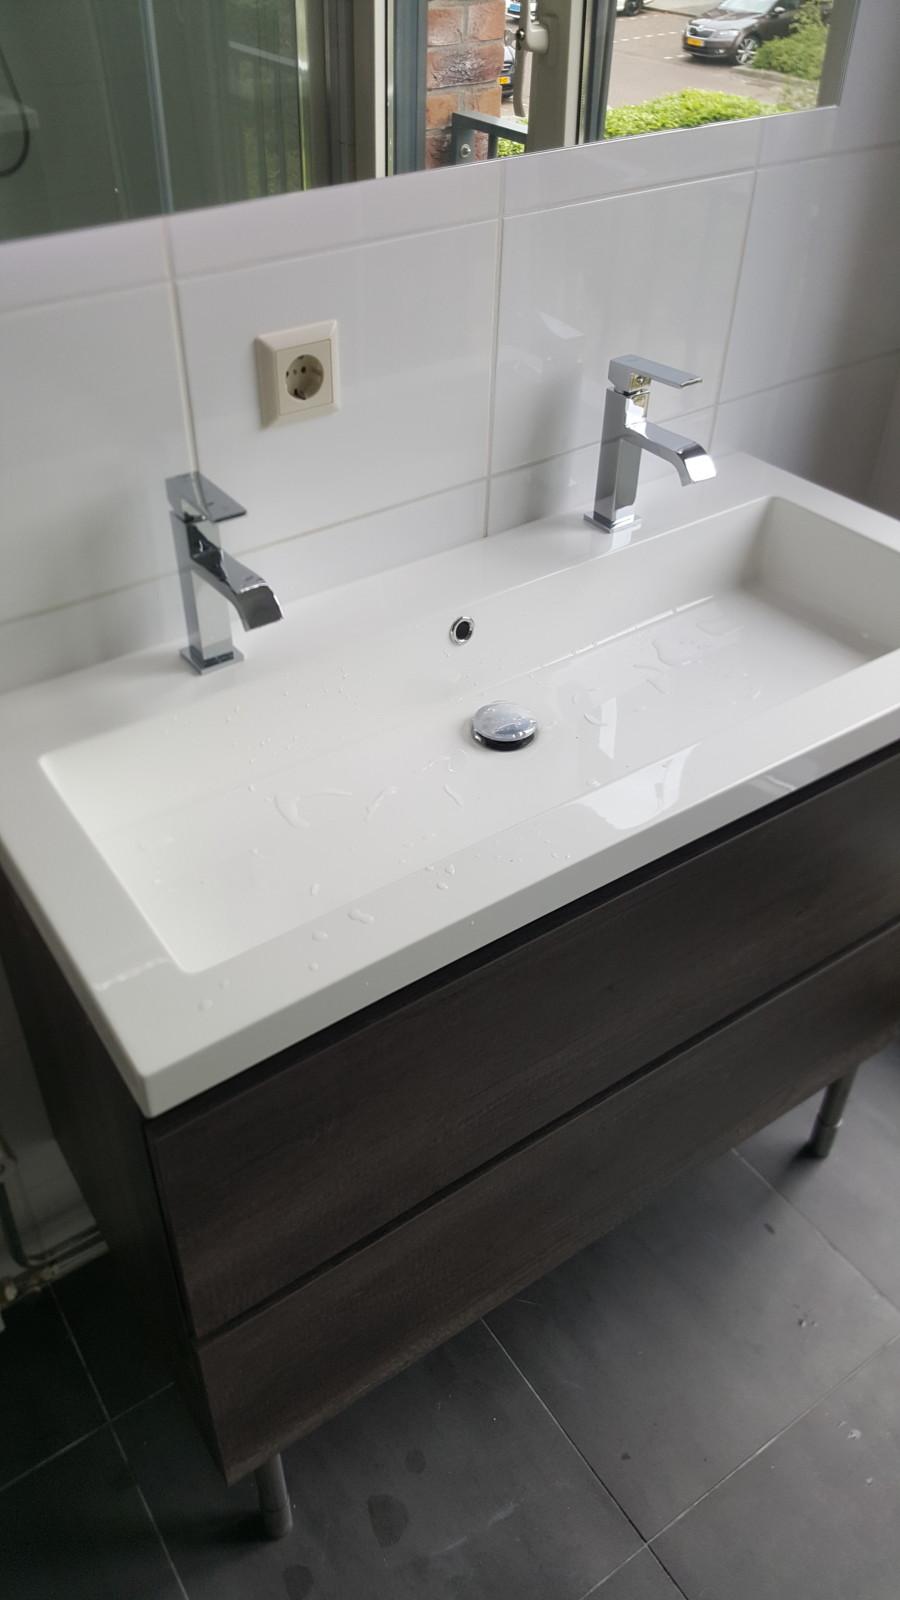 https://backend.klussenier.net/images/profiles/351359/document/16759-badkamer-wastafel-meubel-vervangen-in-hoofddorp.jpg